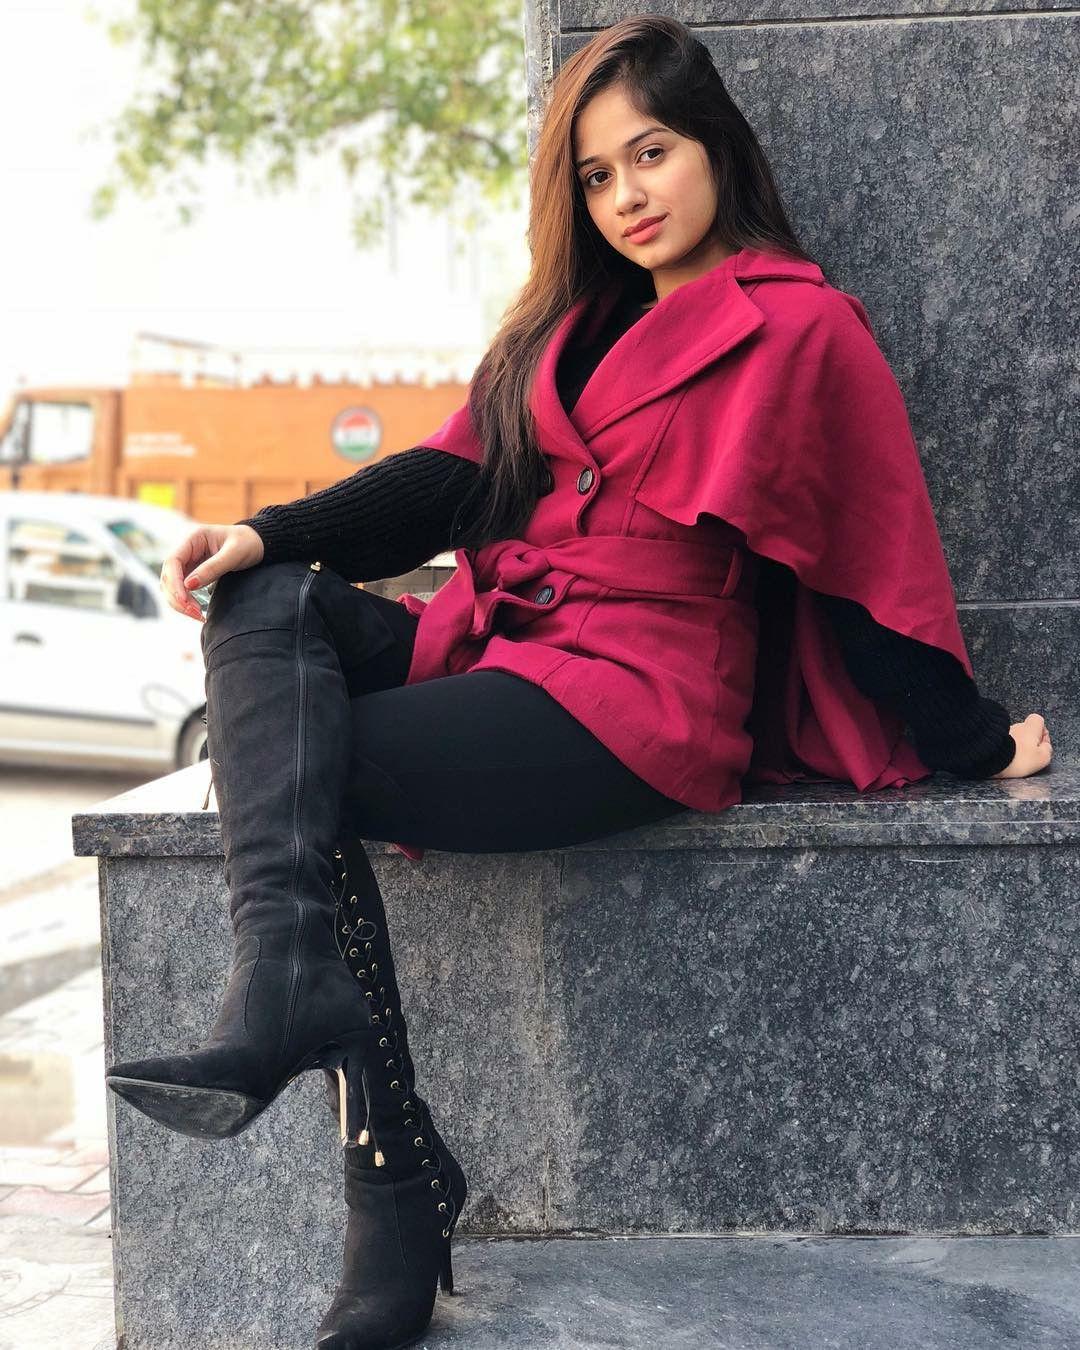 Jannat ÇR GR Stylish girls photos, Stylish girl pic